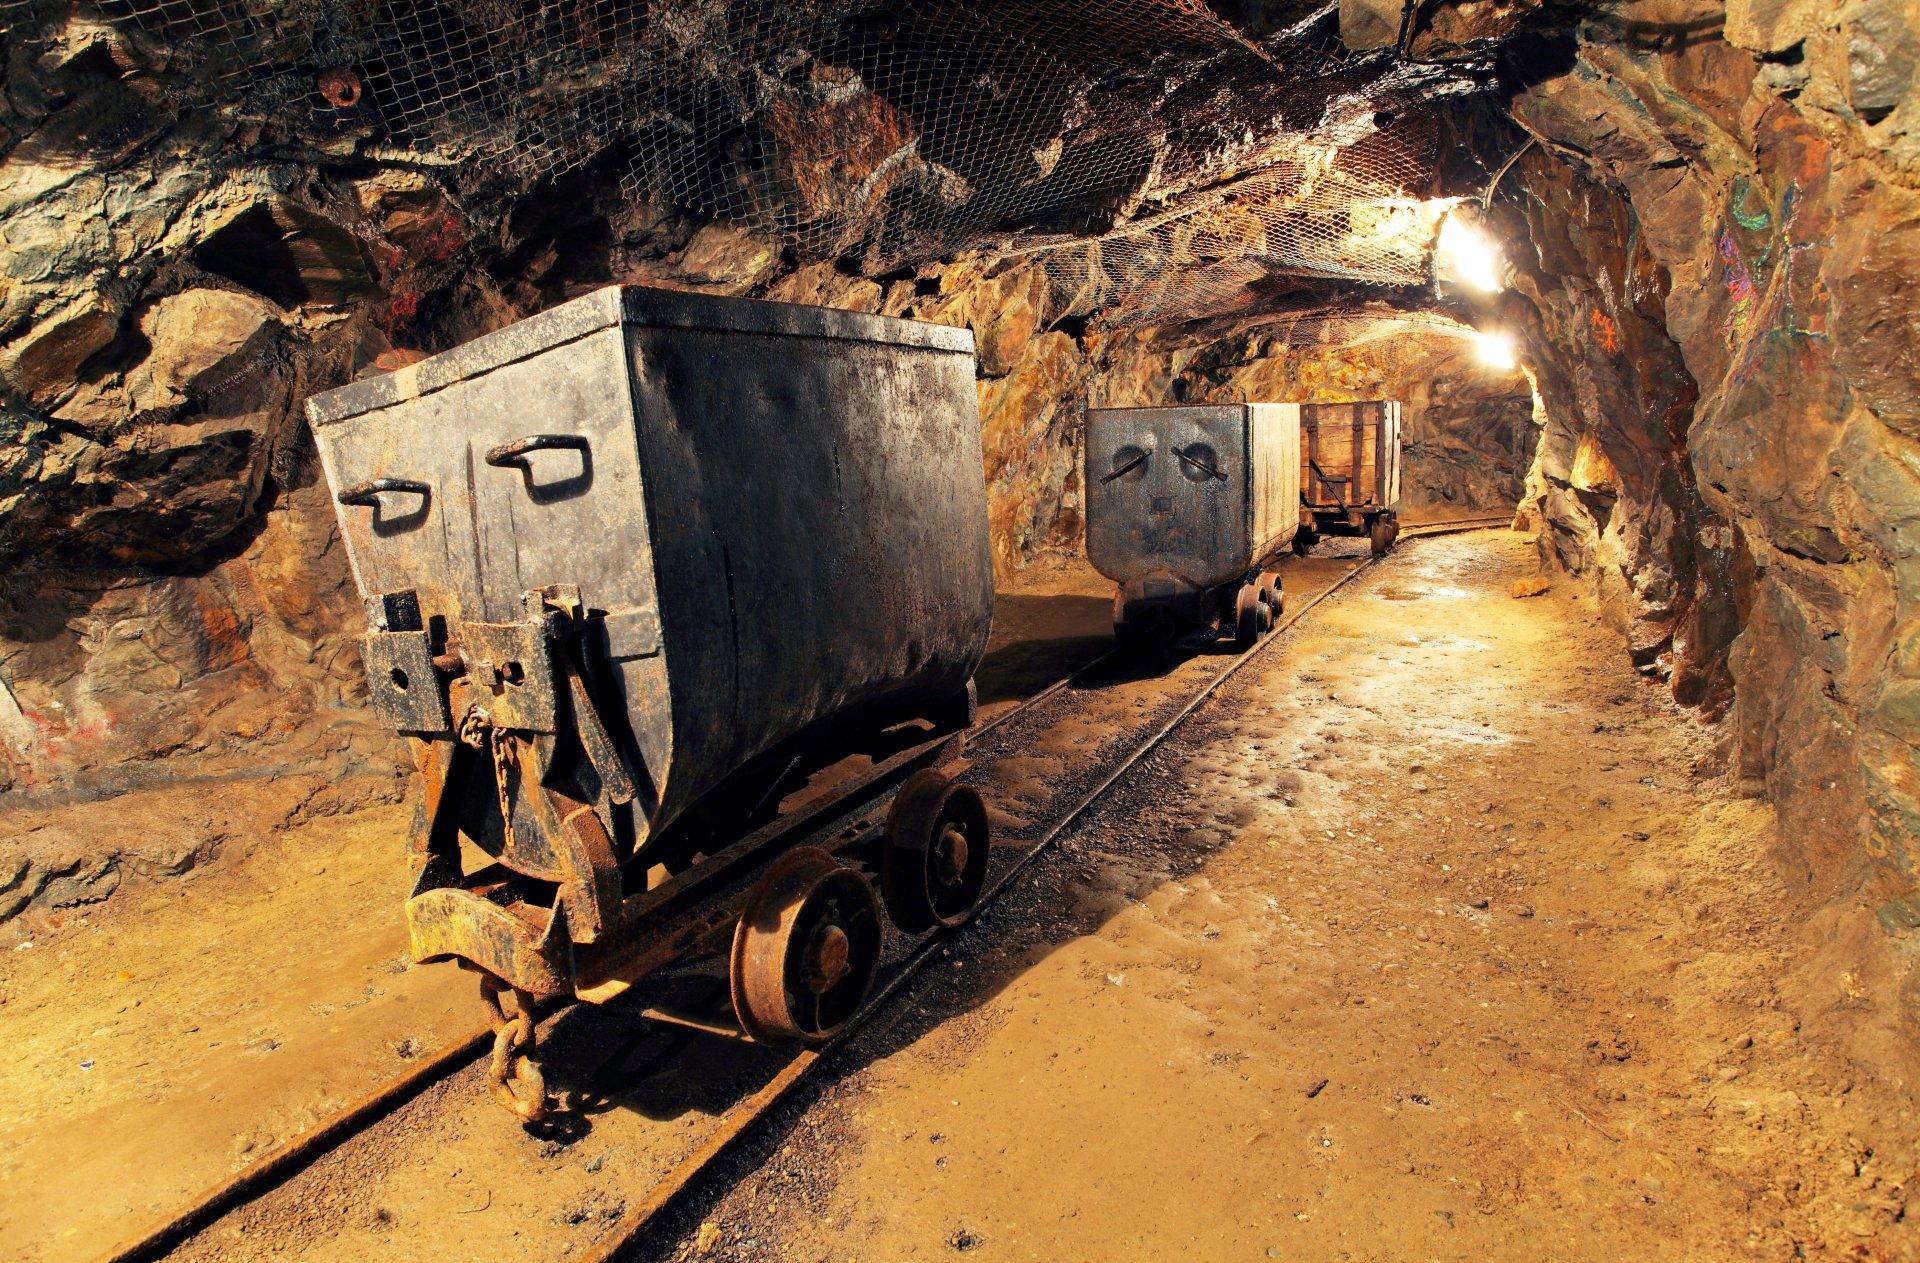 подземка на рудниках рельсах фото руки режим